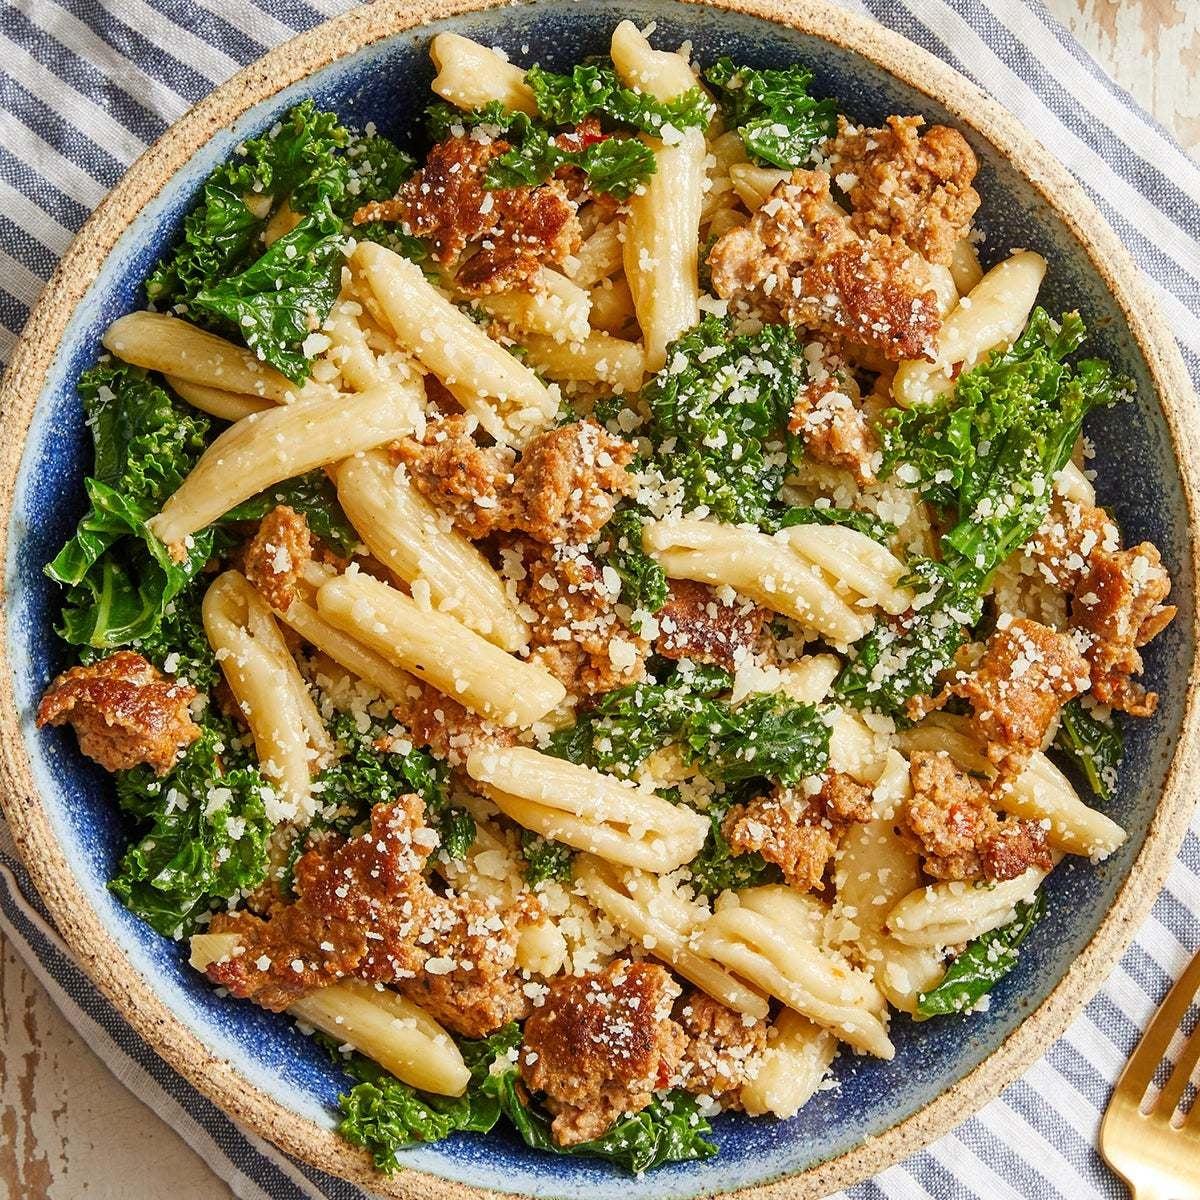 Cavatelli & Hot Italian Pork Sausage with Kale & Parmesan